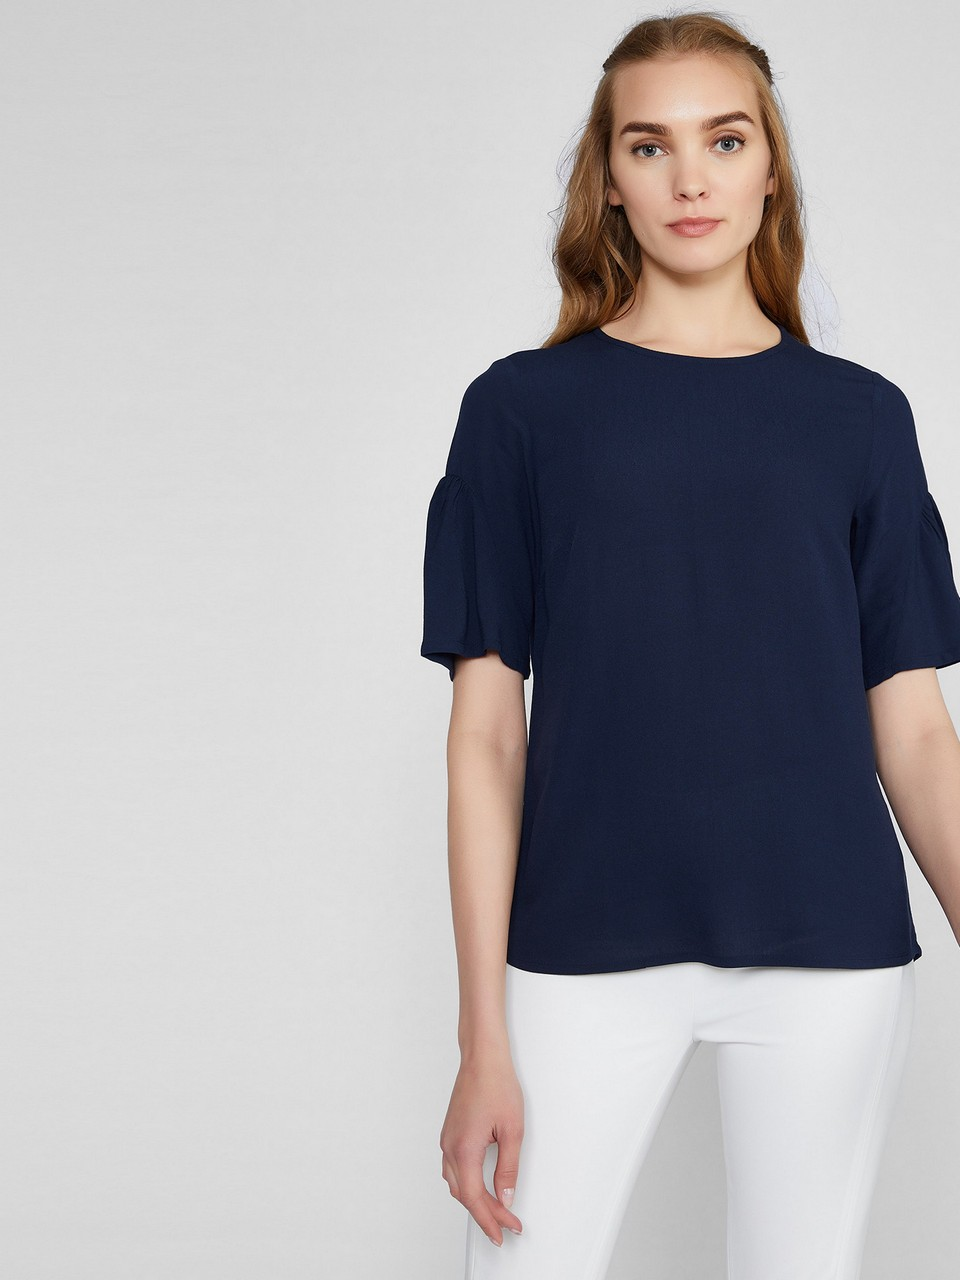 Volanlı Kısa Kol Bluz